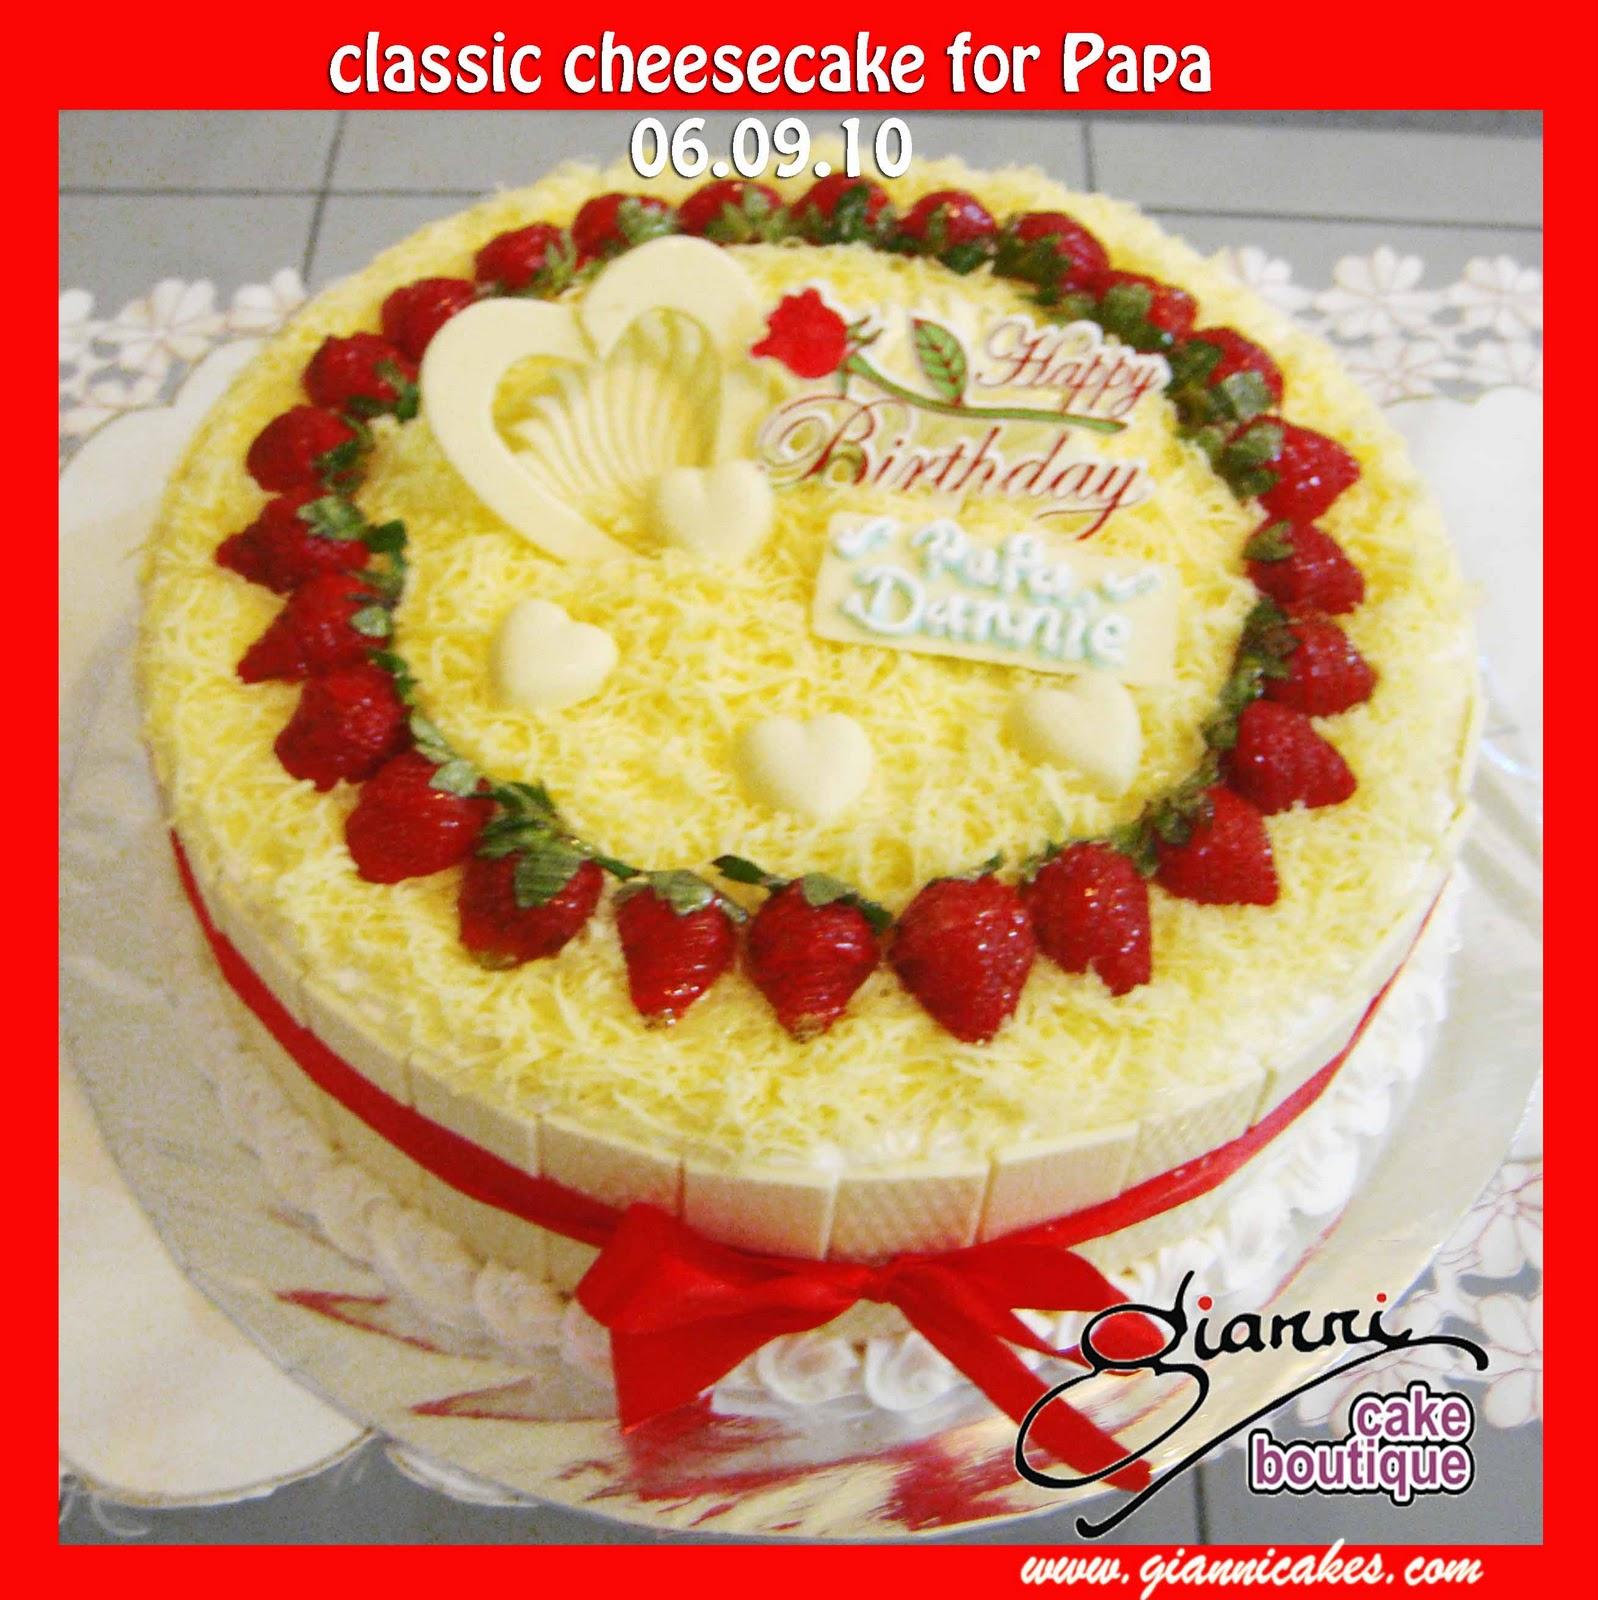 B Day Cake Images For Papa : Gianni Cake Boutique, Online Cake Shop Makassar: September ...